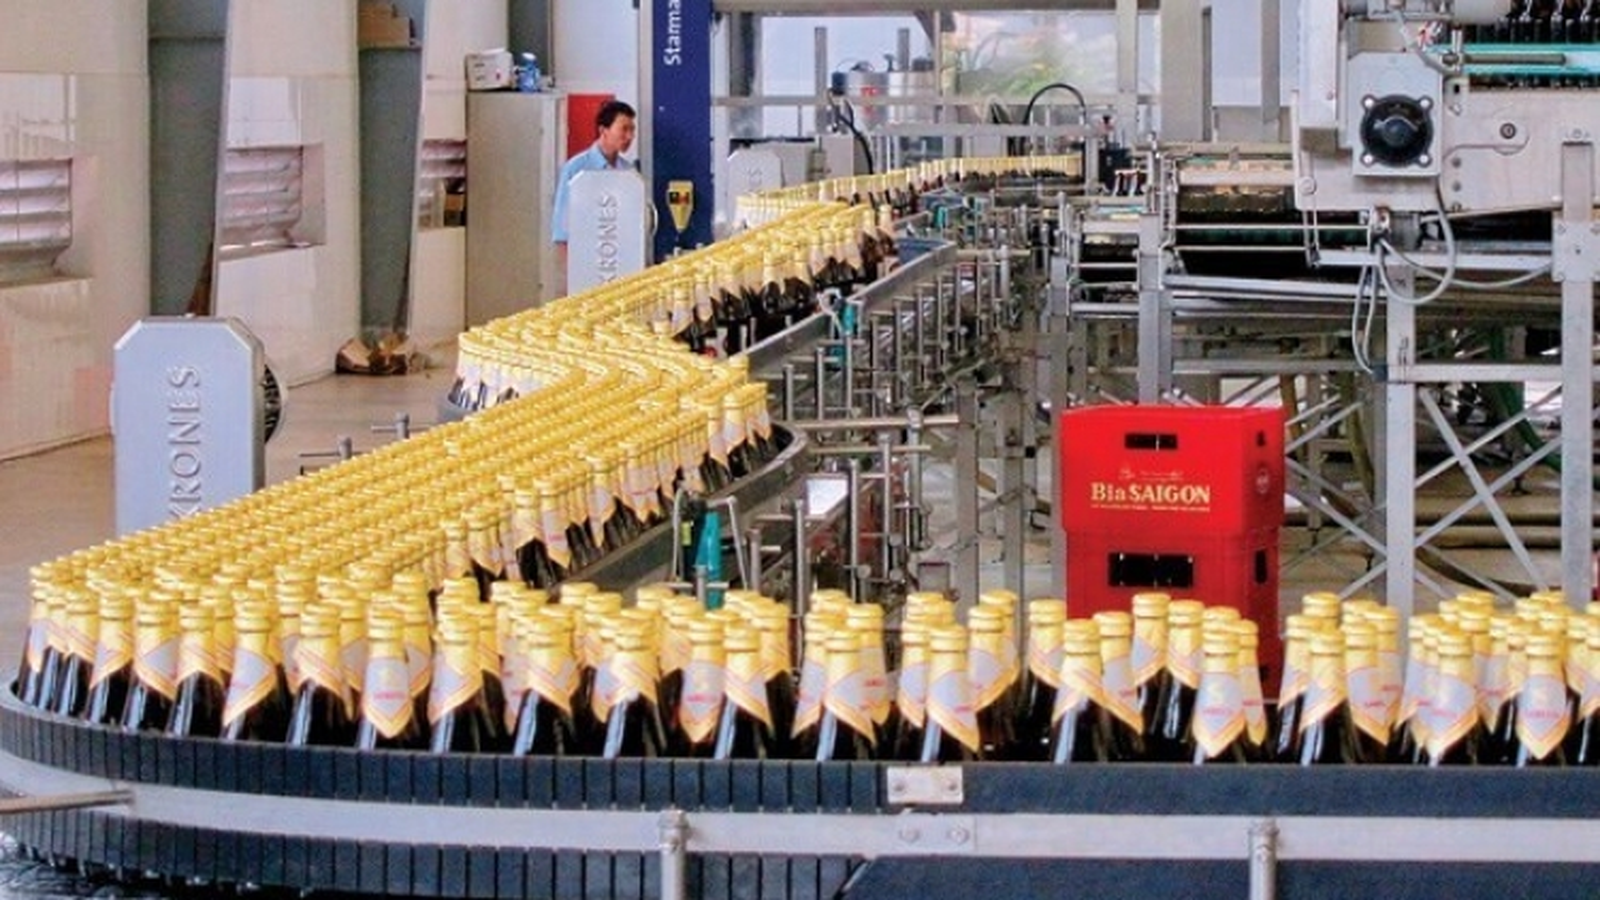 Sabeco sells 53.6% stake for US$4.89 billion